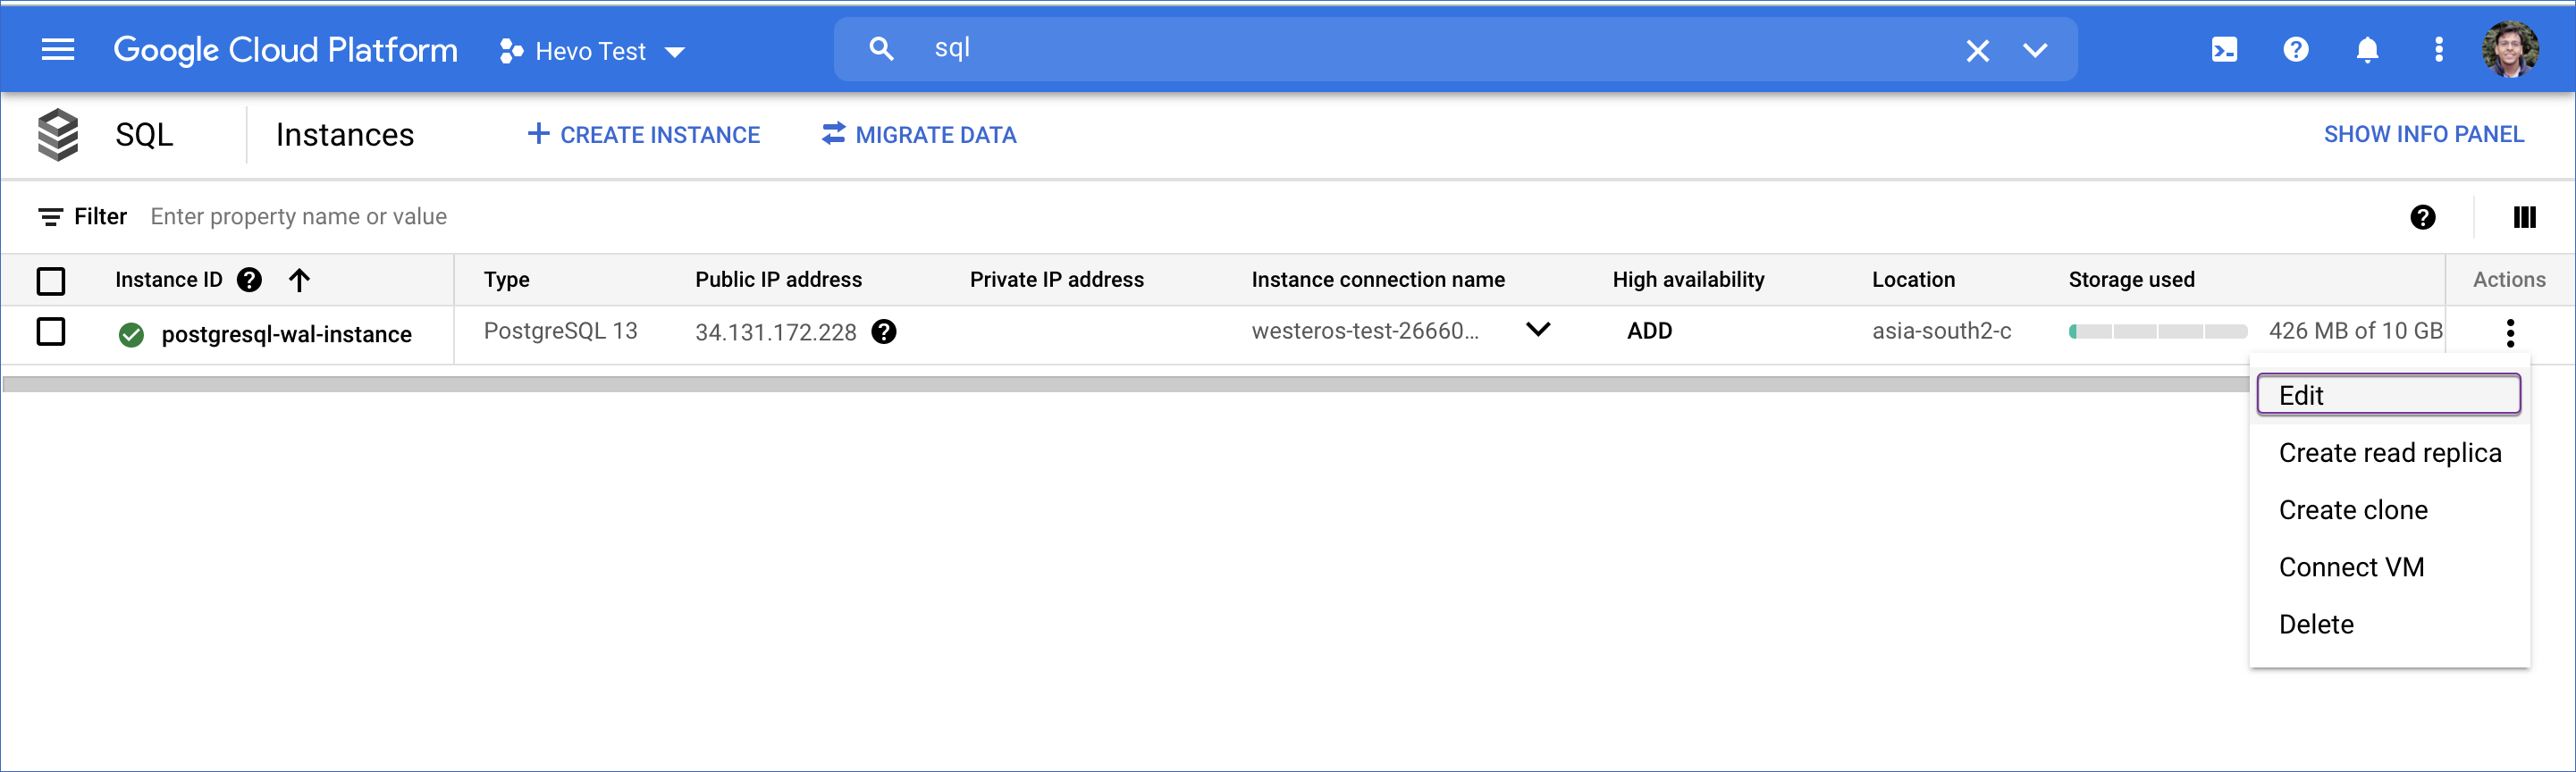 Google Cloud PostgreSQL instance